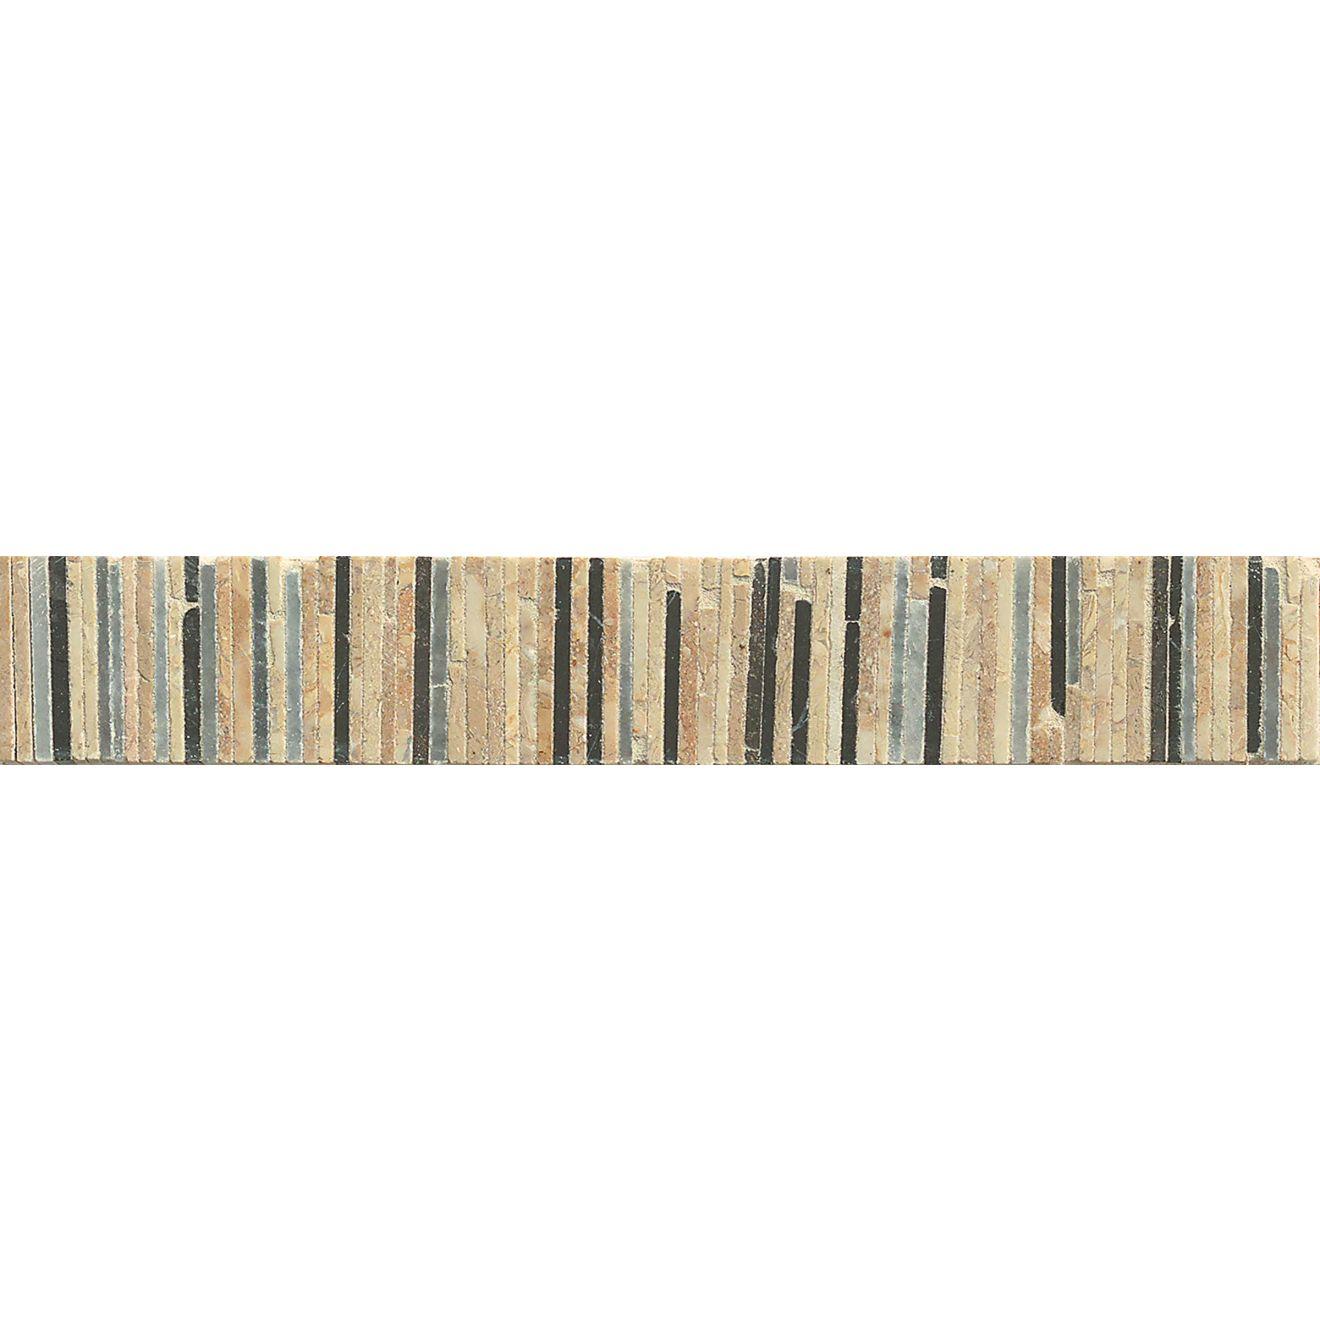 "Menage et Trois 2"" x 11.75"" Floor & Wall Listello in Ebony, Hesperia, Rubidoux"